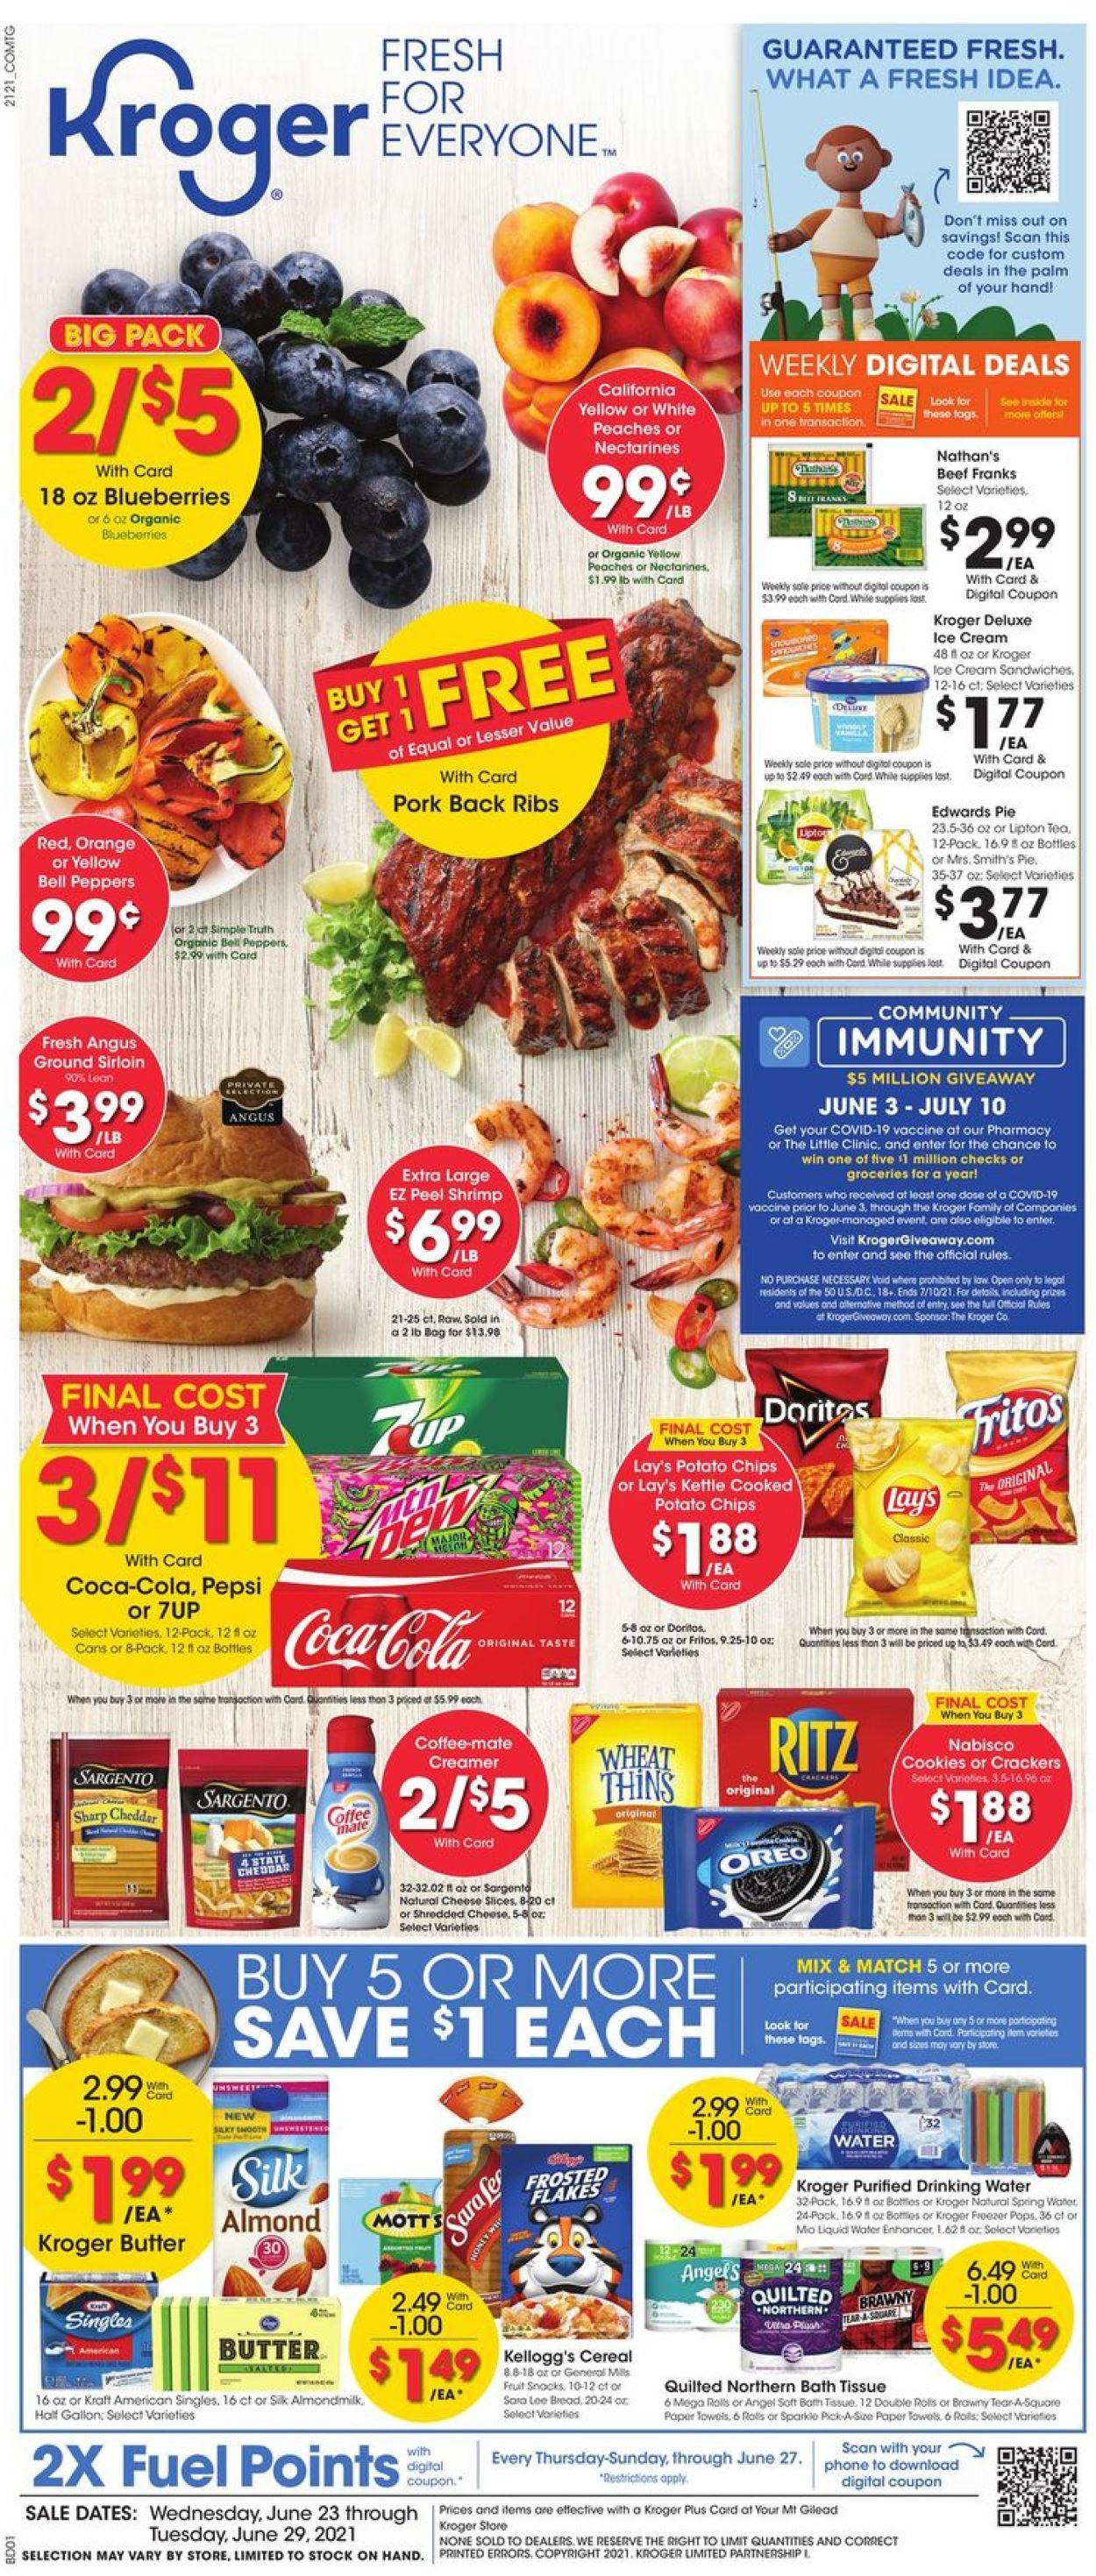 Kroger Weekly Ad Circular - valid 06/23-06/29/2021